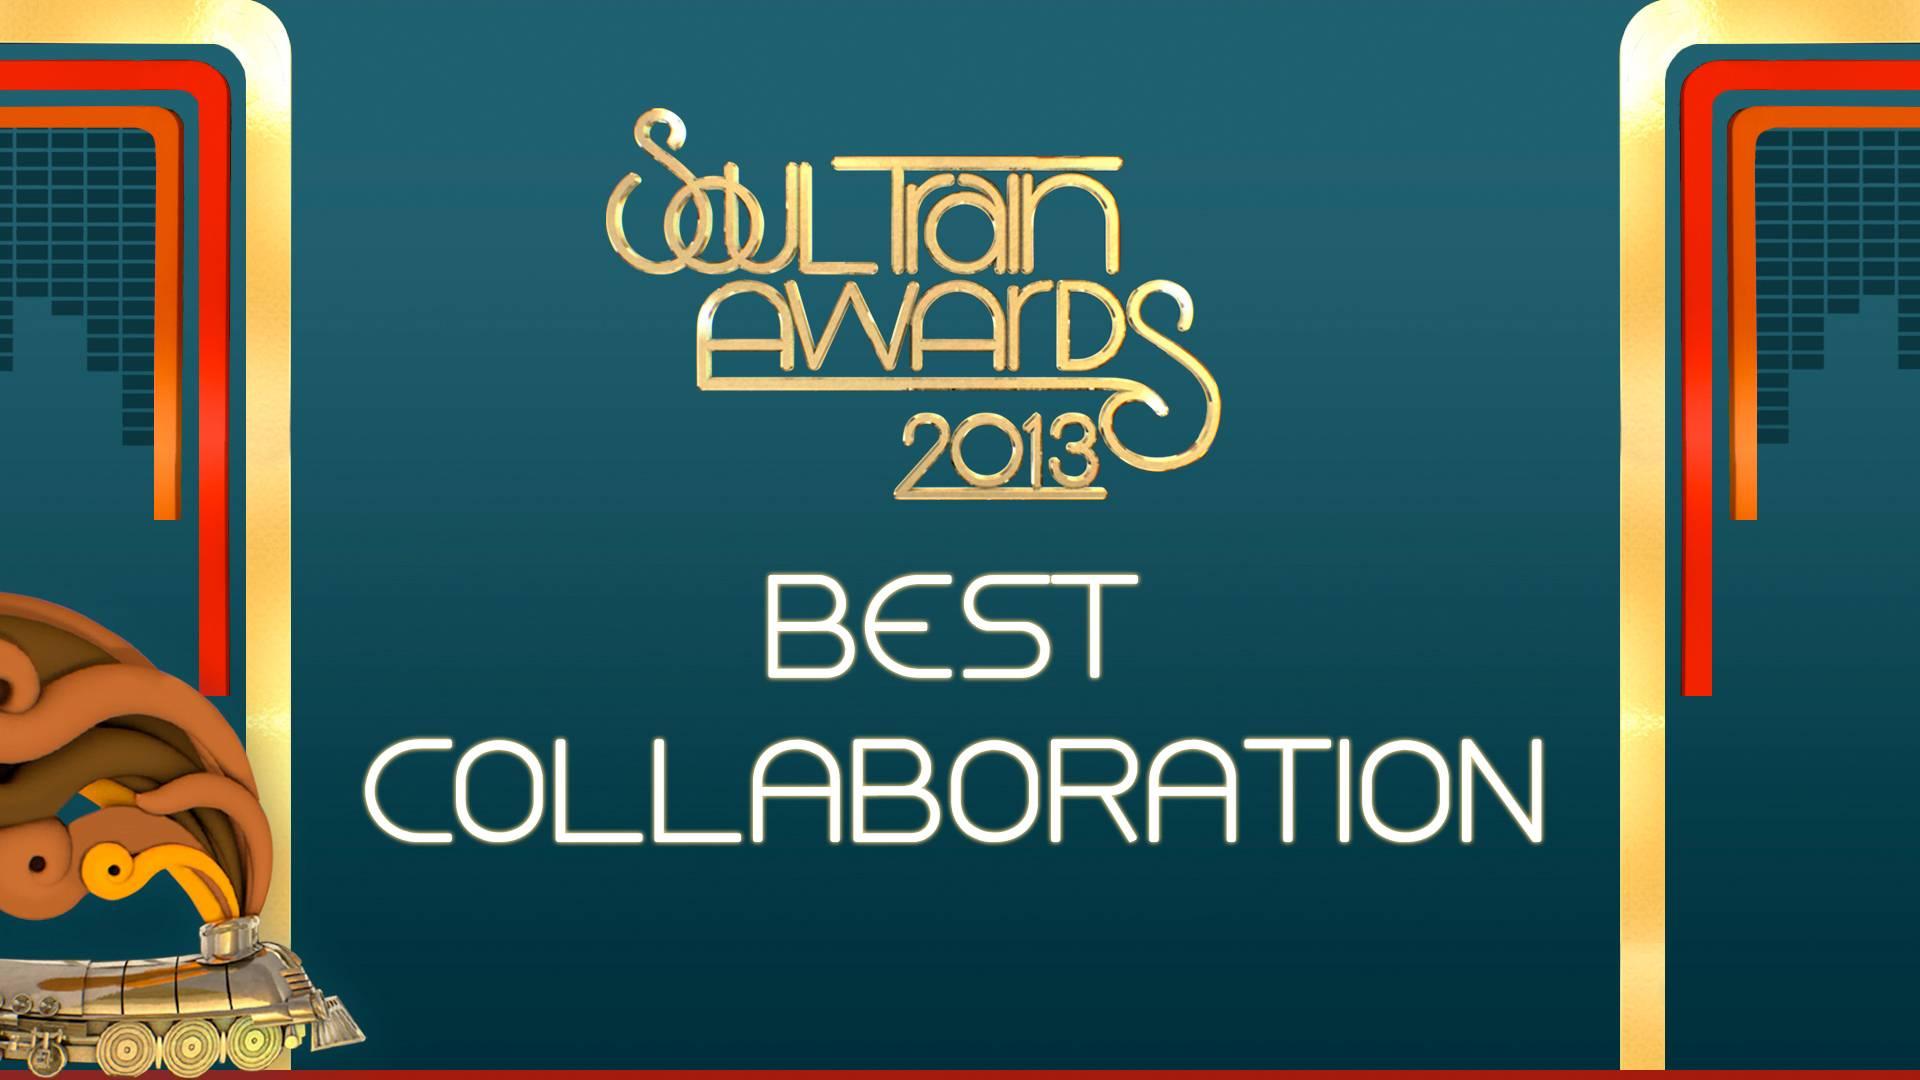 Best Collaboration